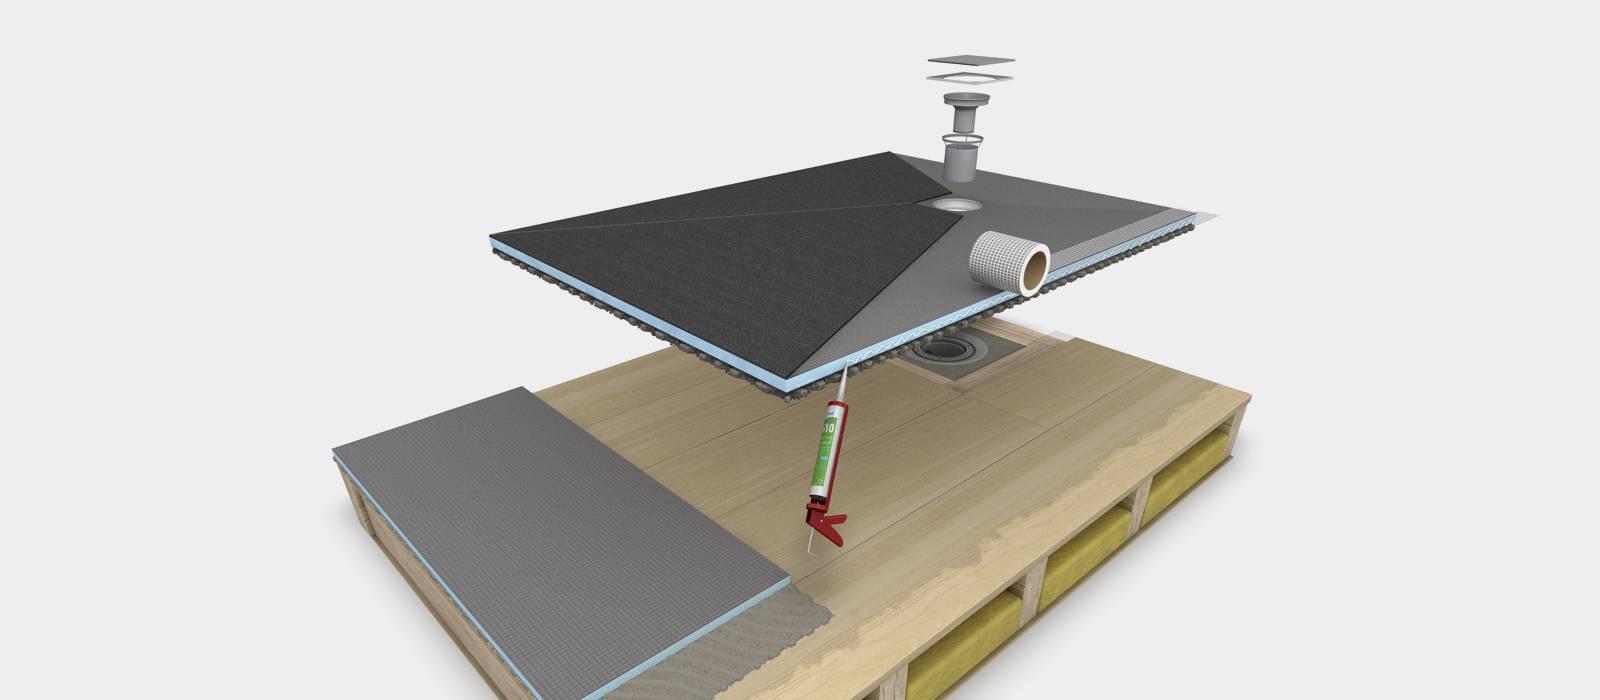 centrale afvoer op houten vloeren opbouw fundo ligno. Black Bedroom Furniture Sets. Home Design Ideas